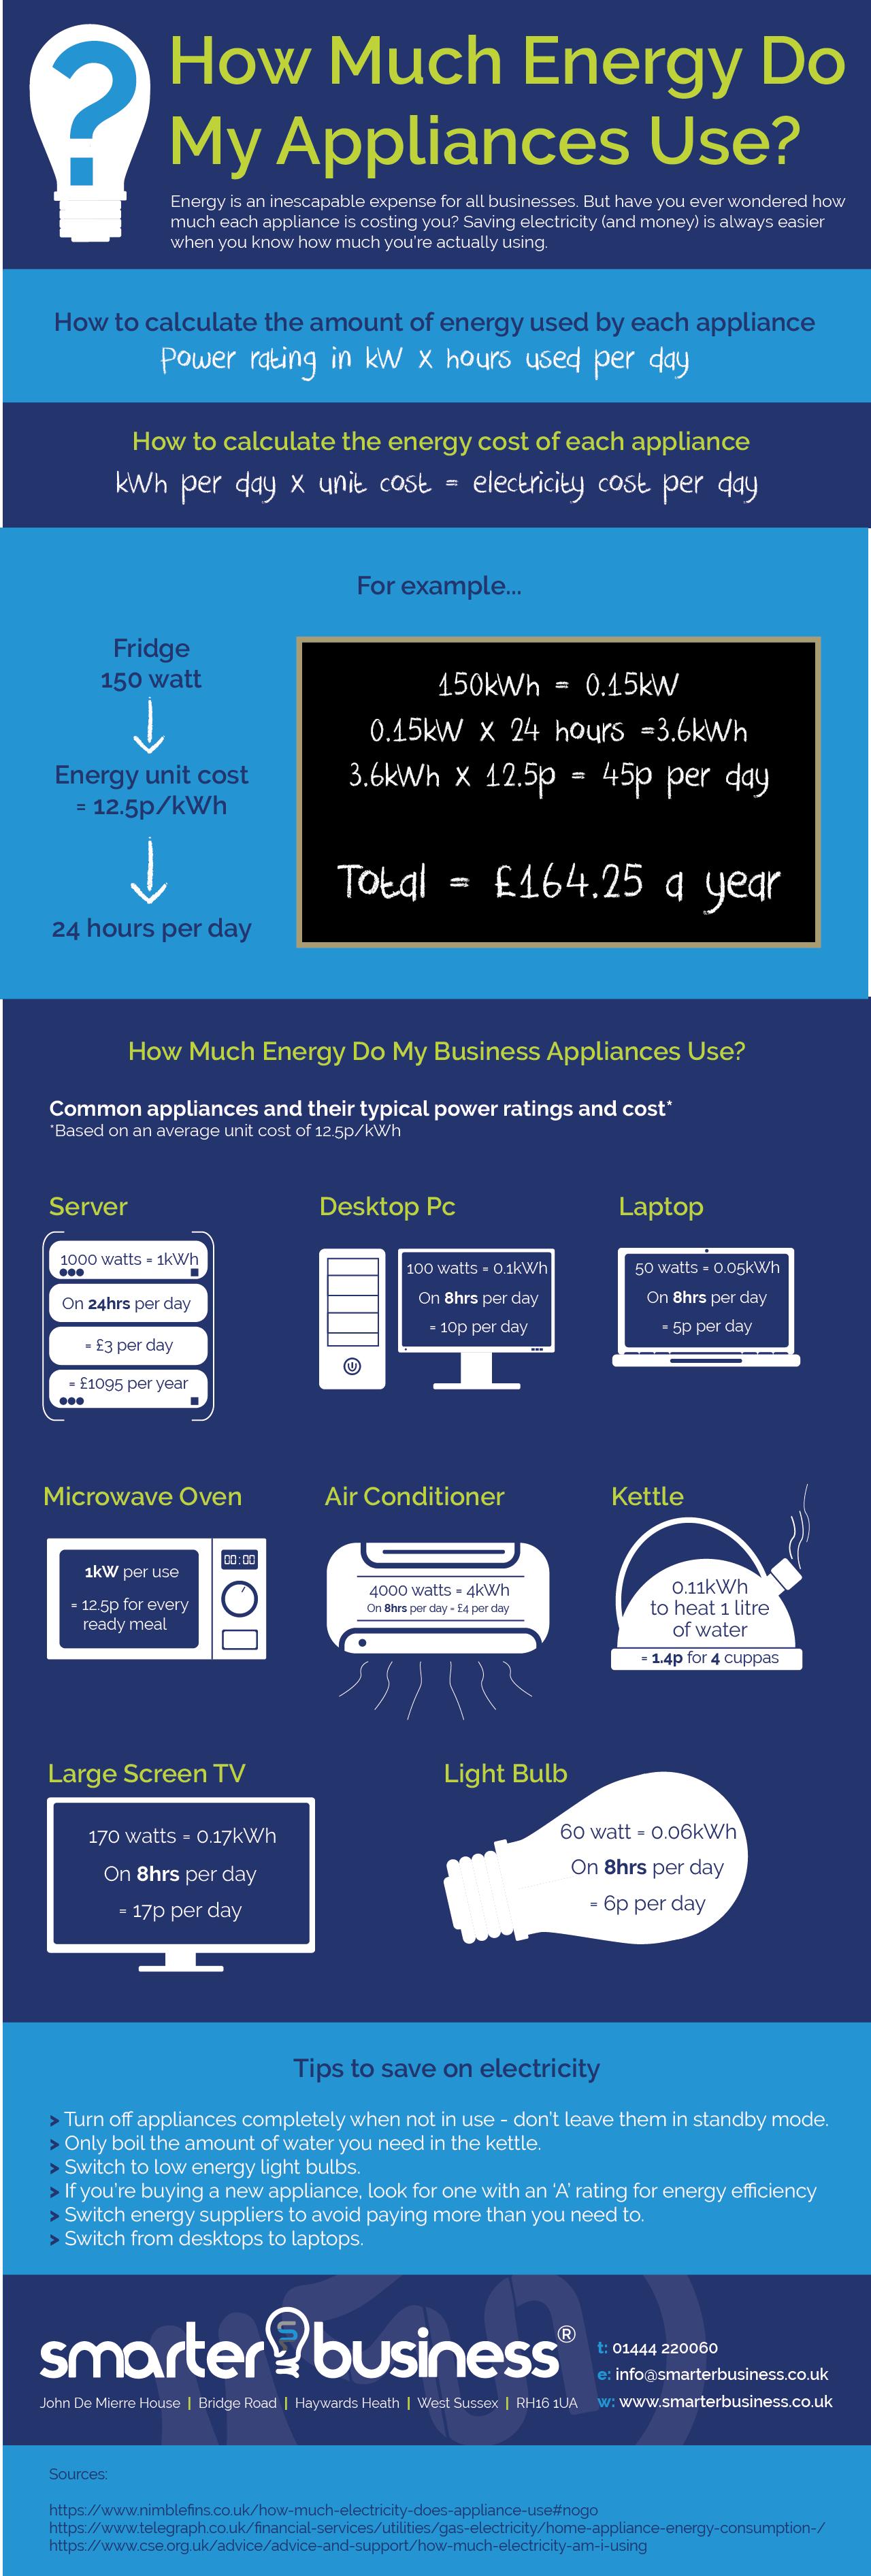 How much energy do my appliances use?